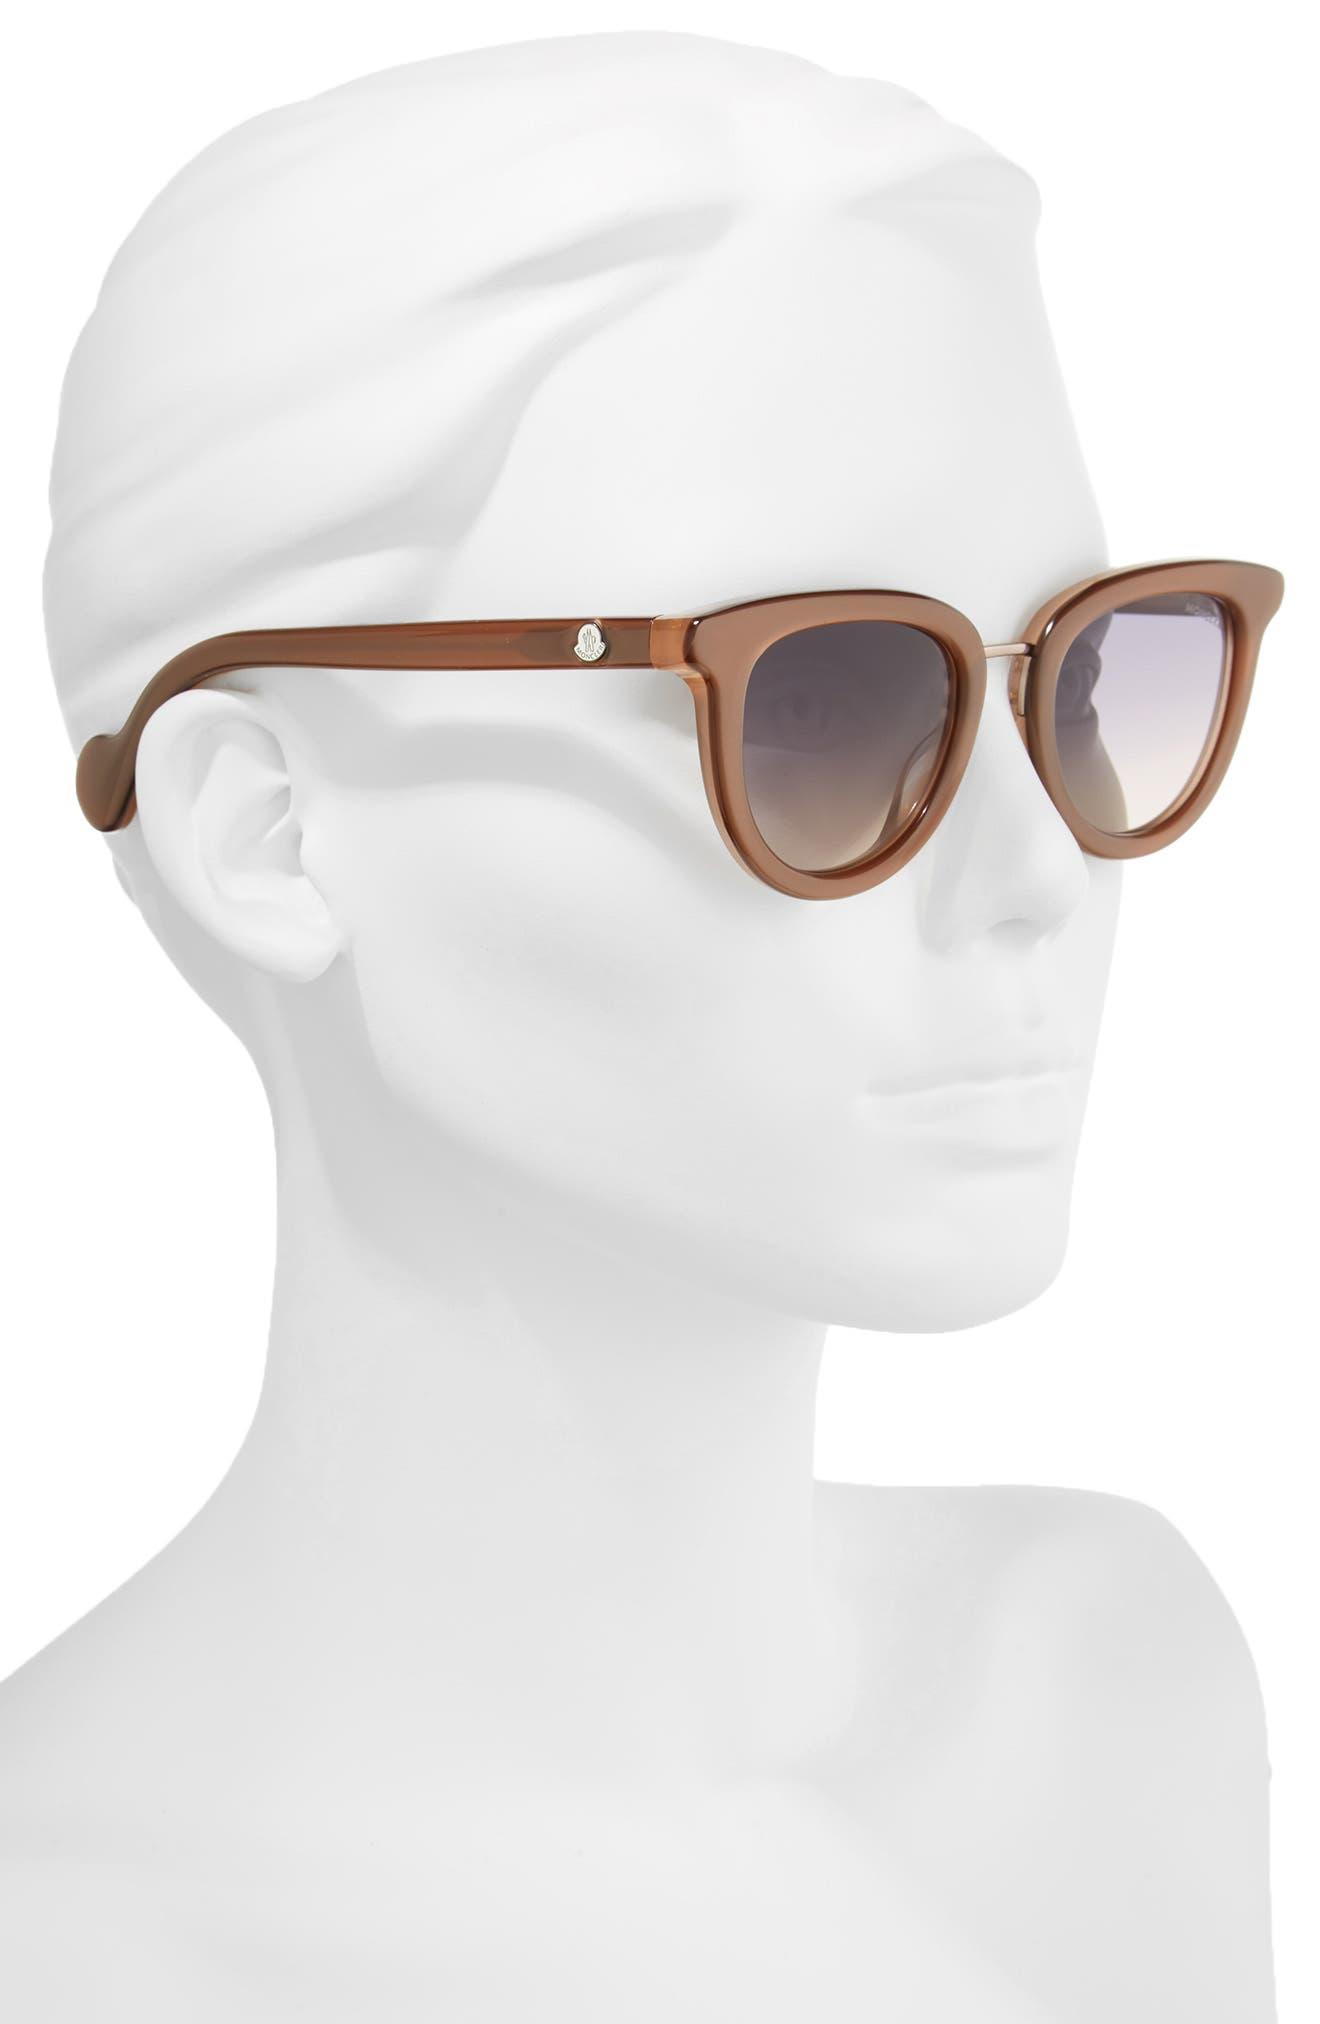 MONCLER, 48mm Cat Eye Sunglasses, Alternate thumbnail 2, color, PEARL BROWN/ GREY/ SAND